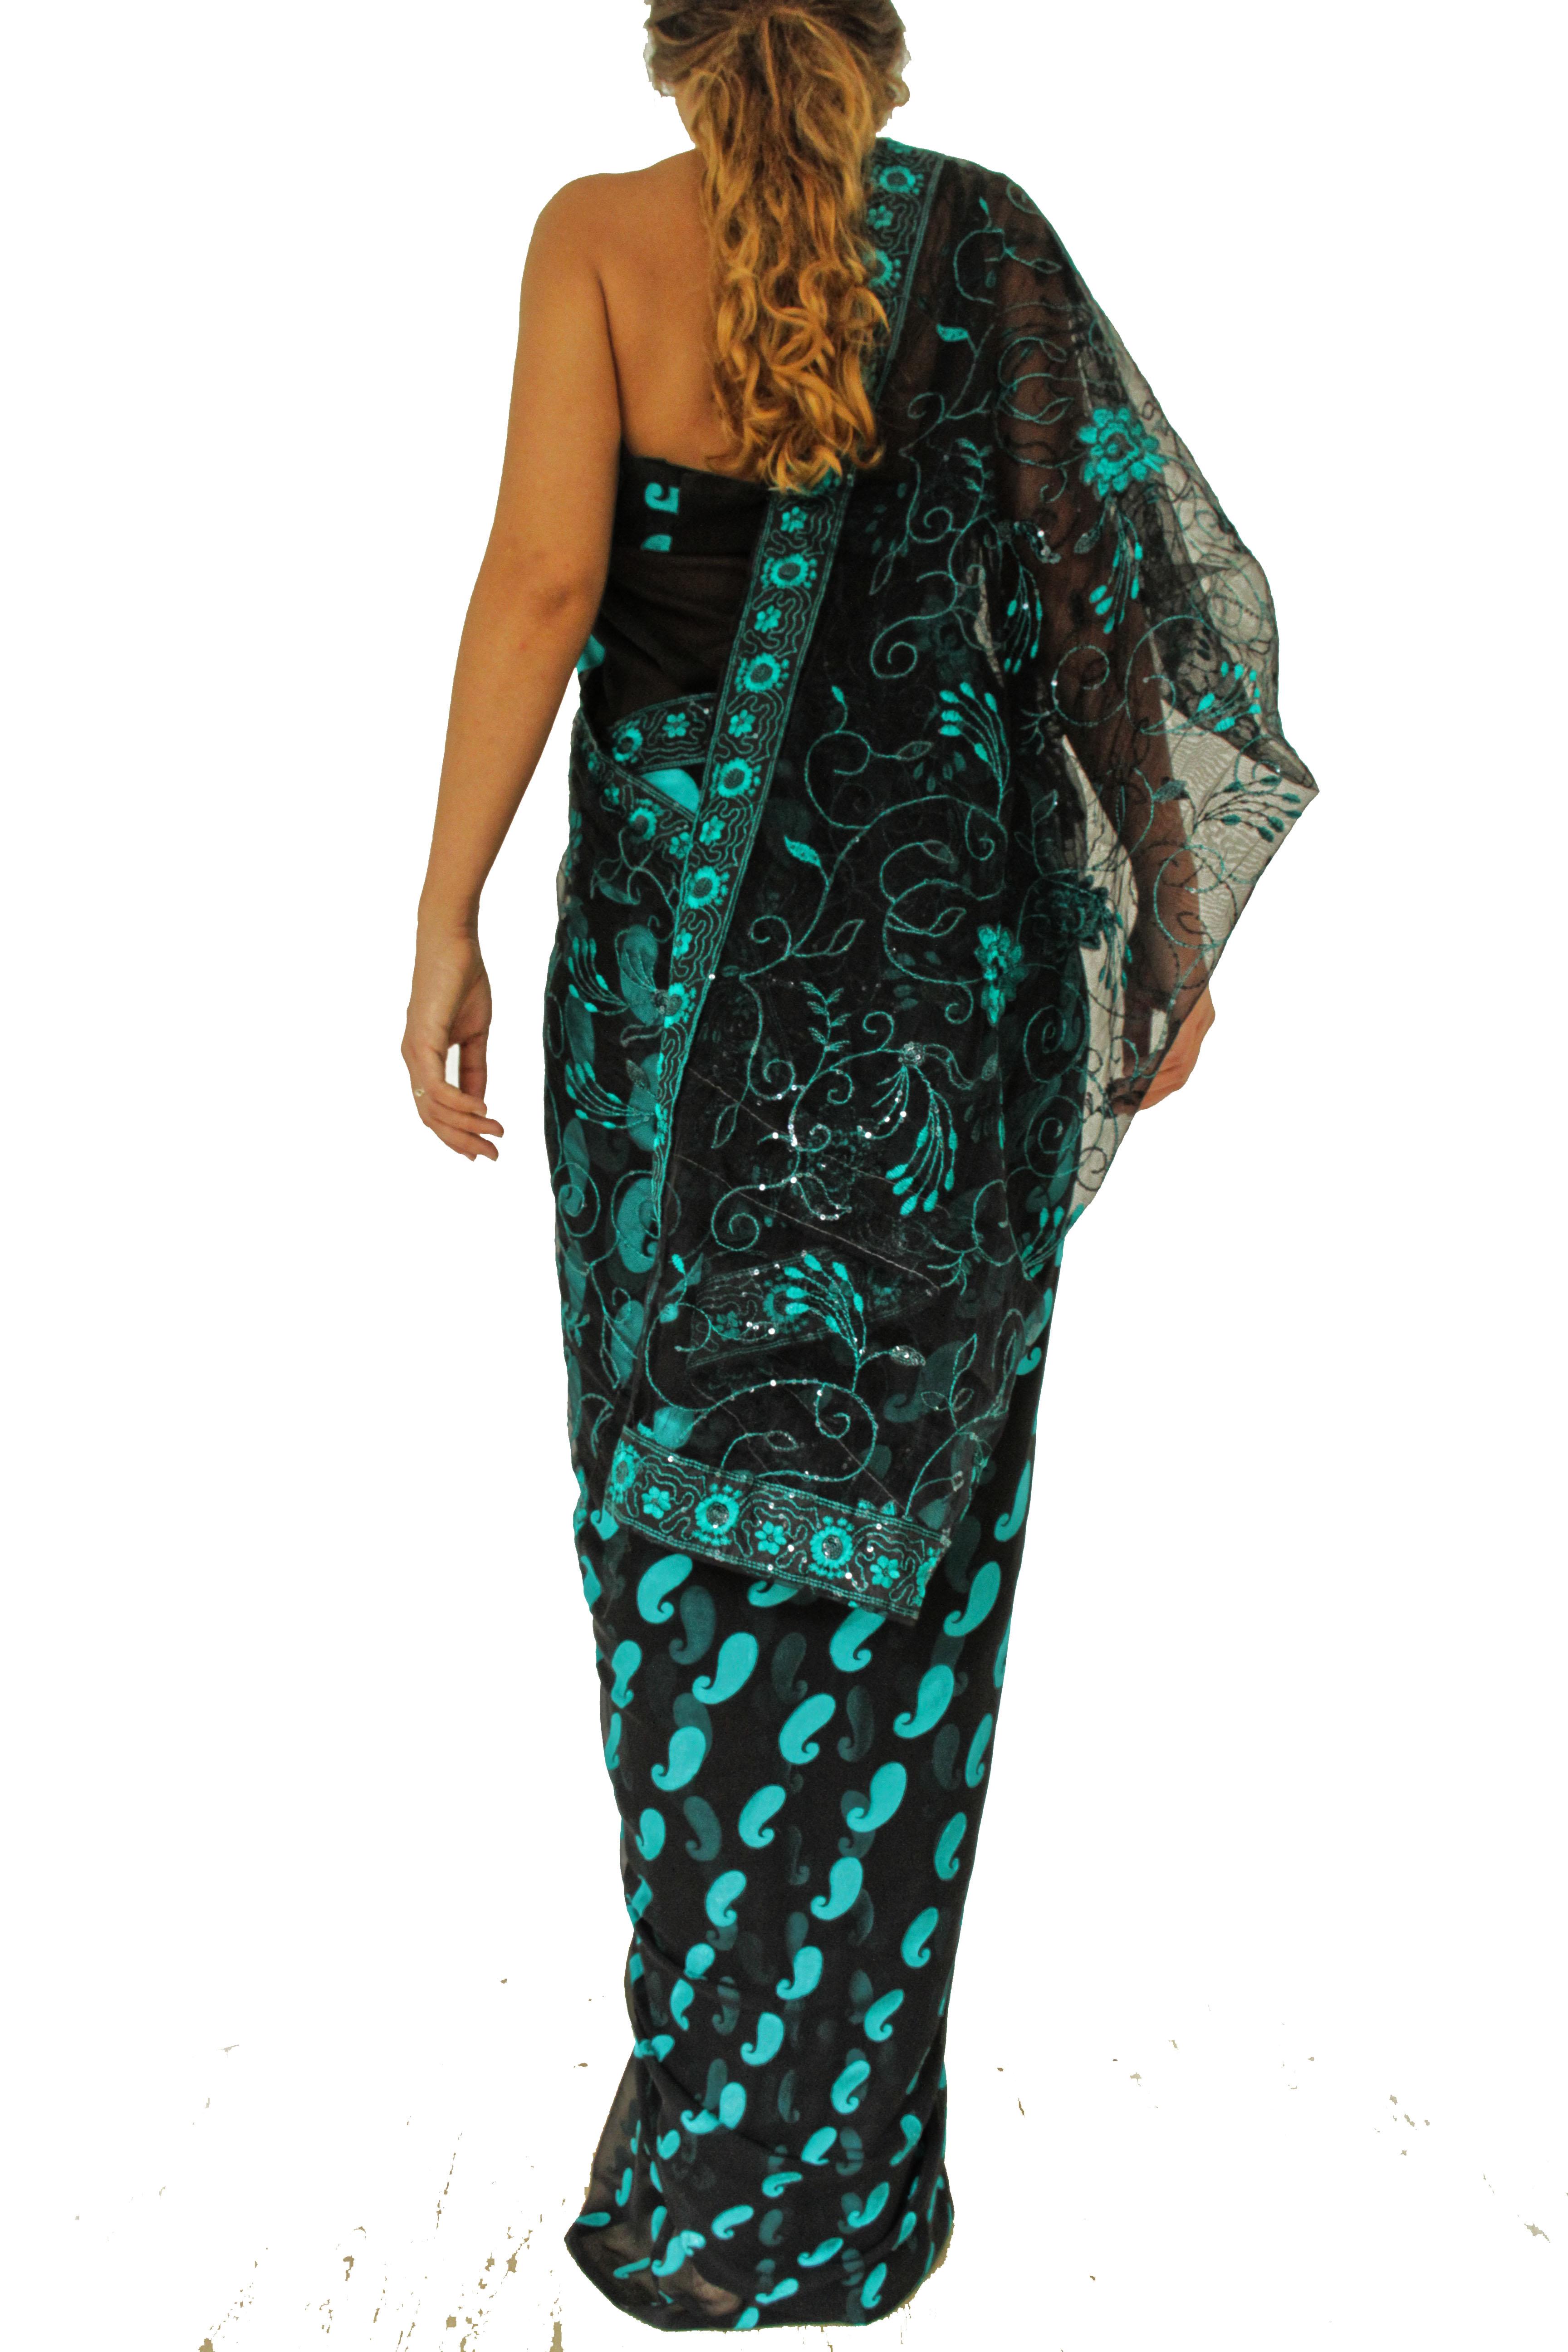 Beau saree sari indien oriental de dubai. Sari grande taille pour femme ronde. SARI moderne sur paris en vente ou location. Sari bollywood pas cher.